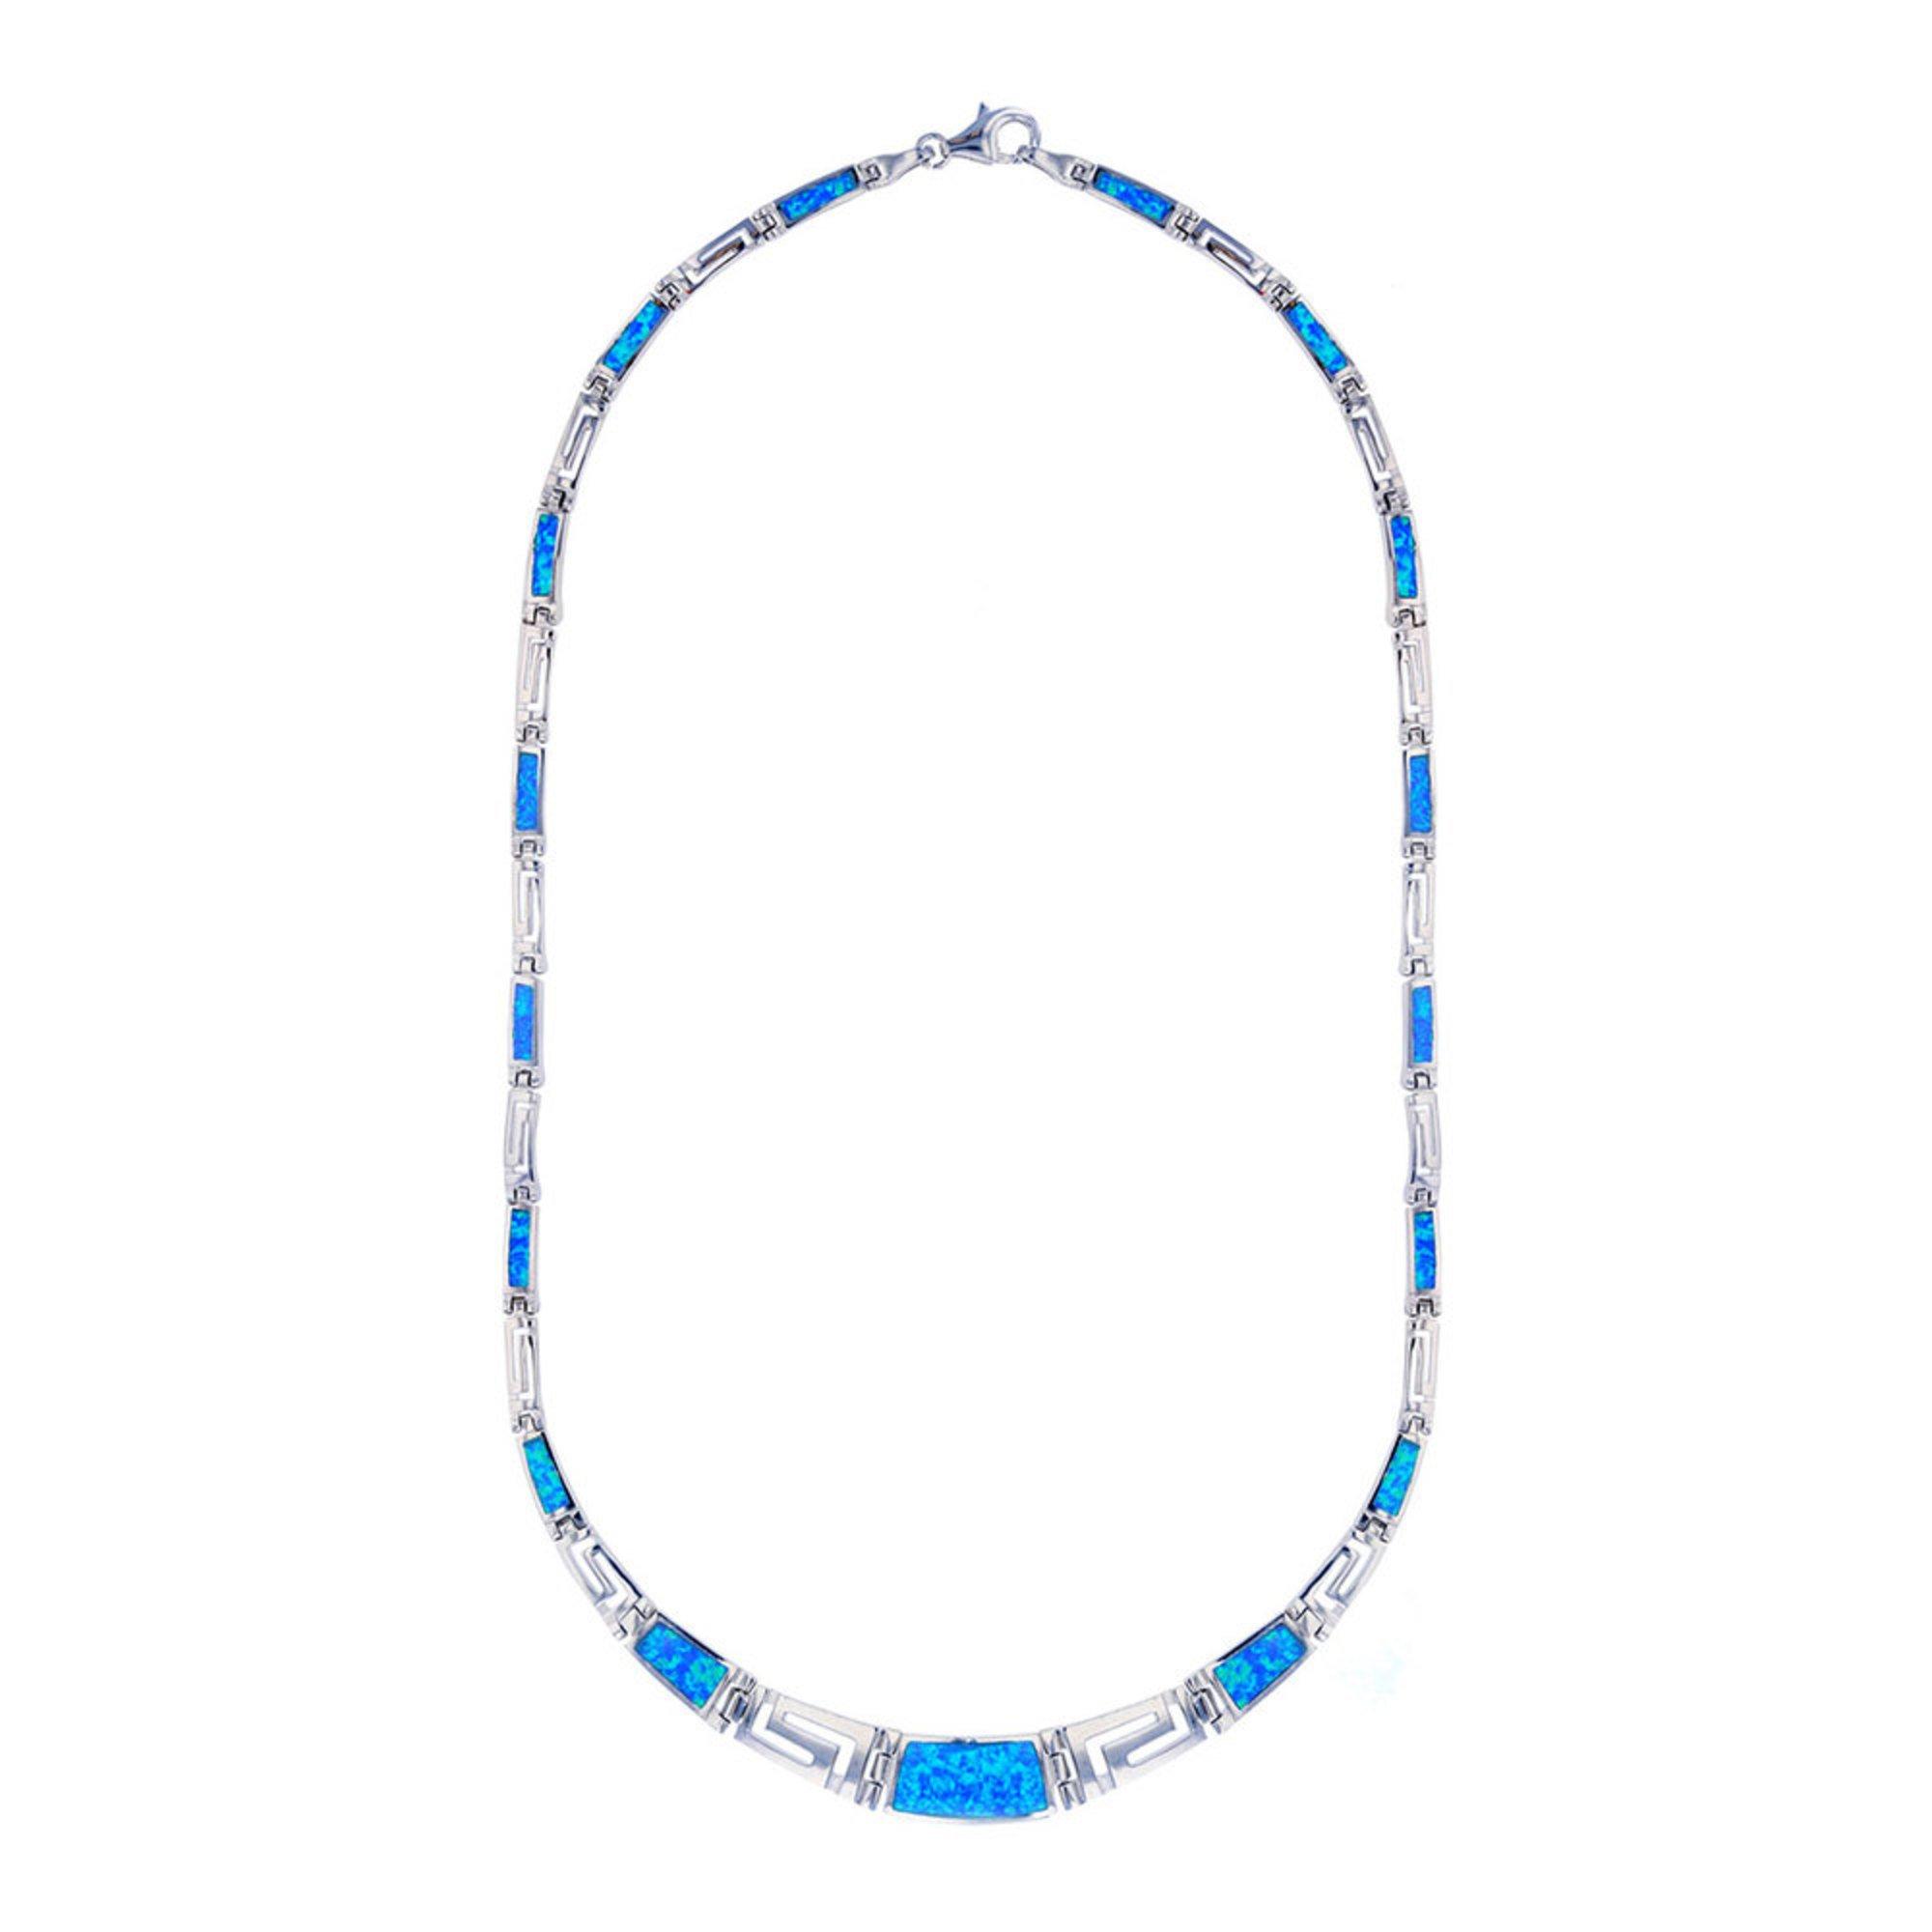 Bijoux Du Soleil Created Opal 18